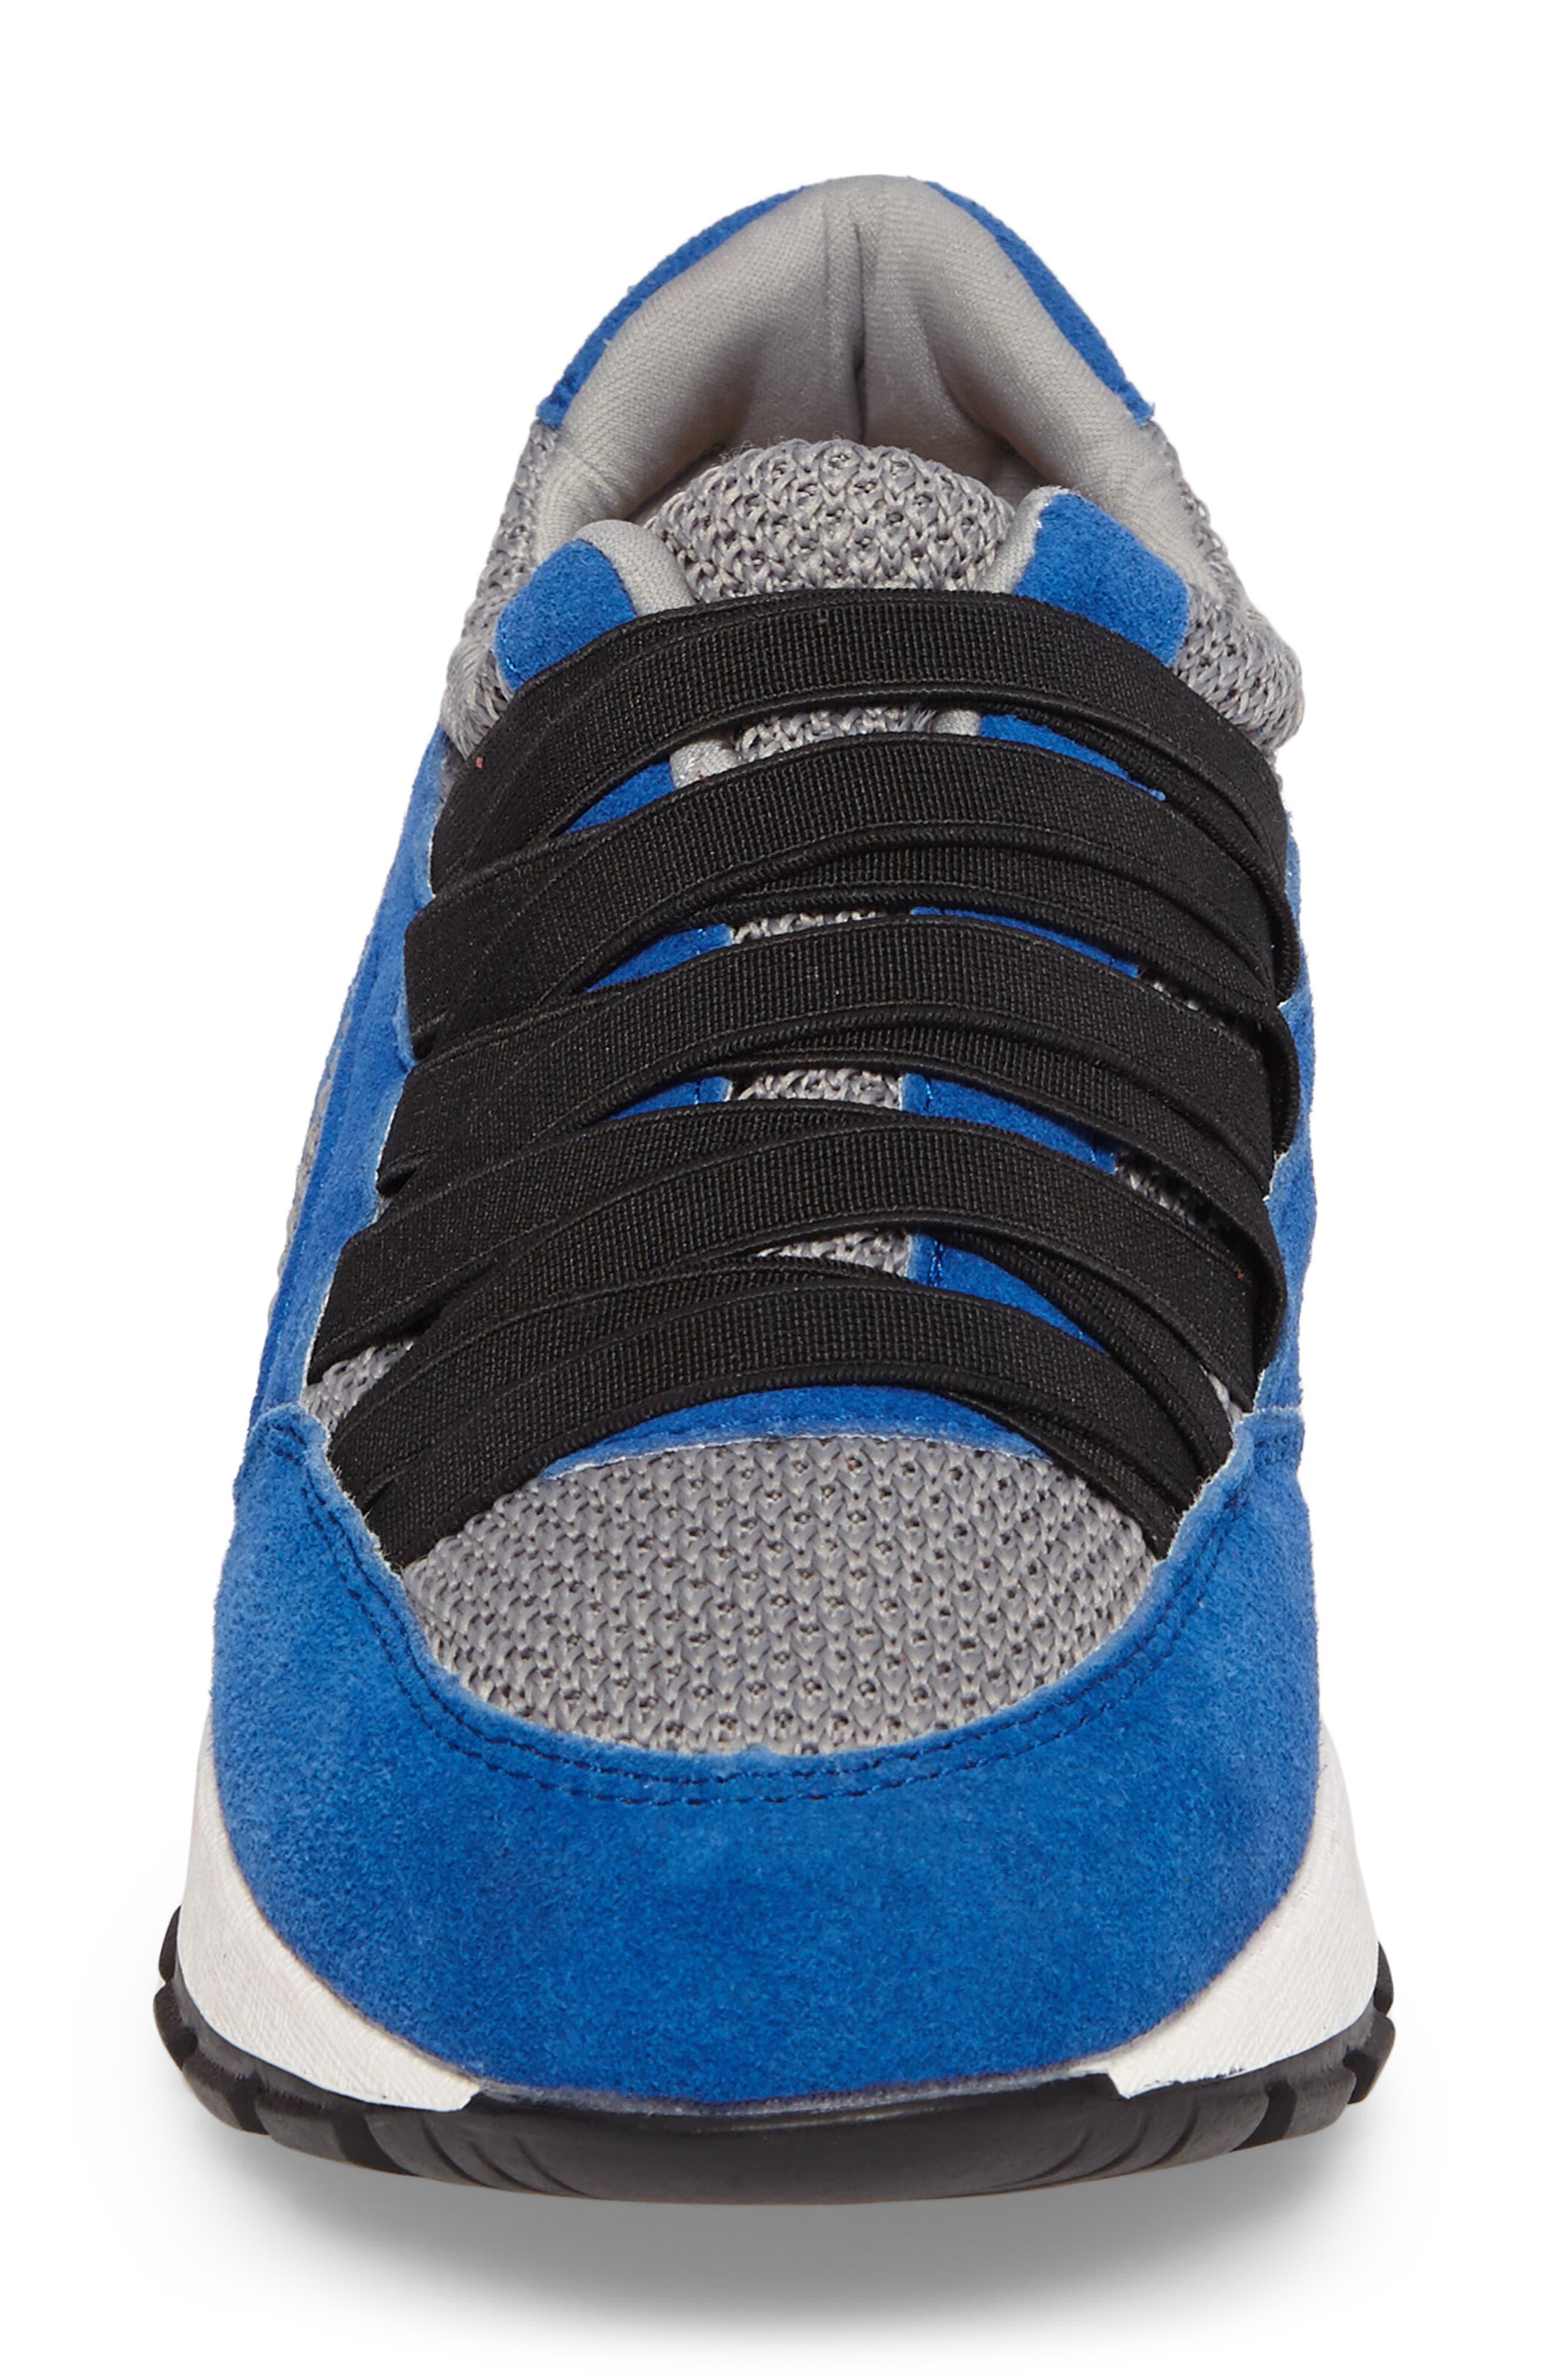 Bernie Mev Tara Cano Sneaker,                             Alternate thumbnail 4, color,                             ROYAL BLUE/ GREY FABRIC